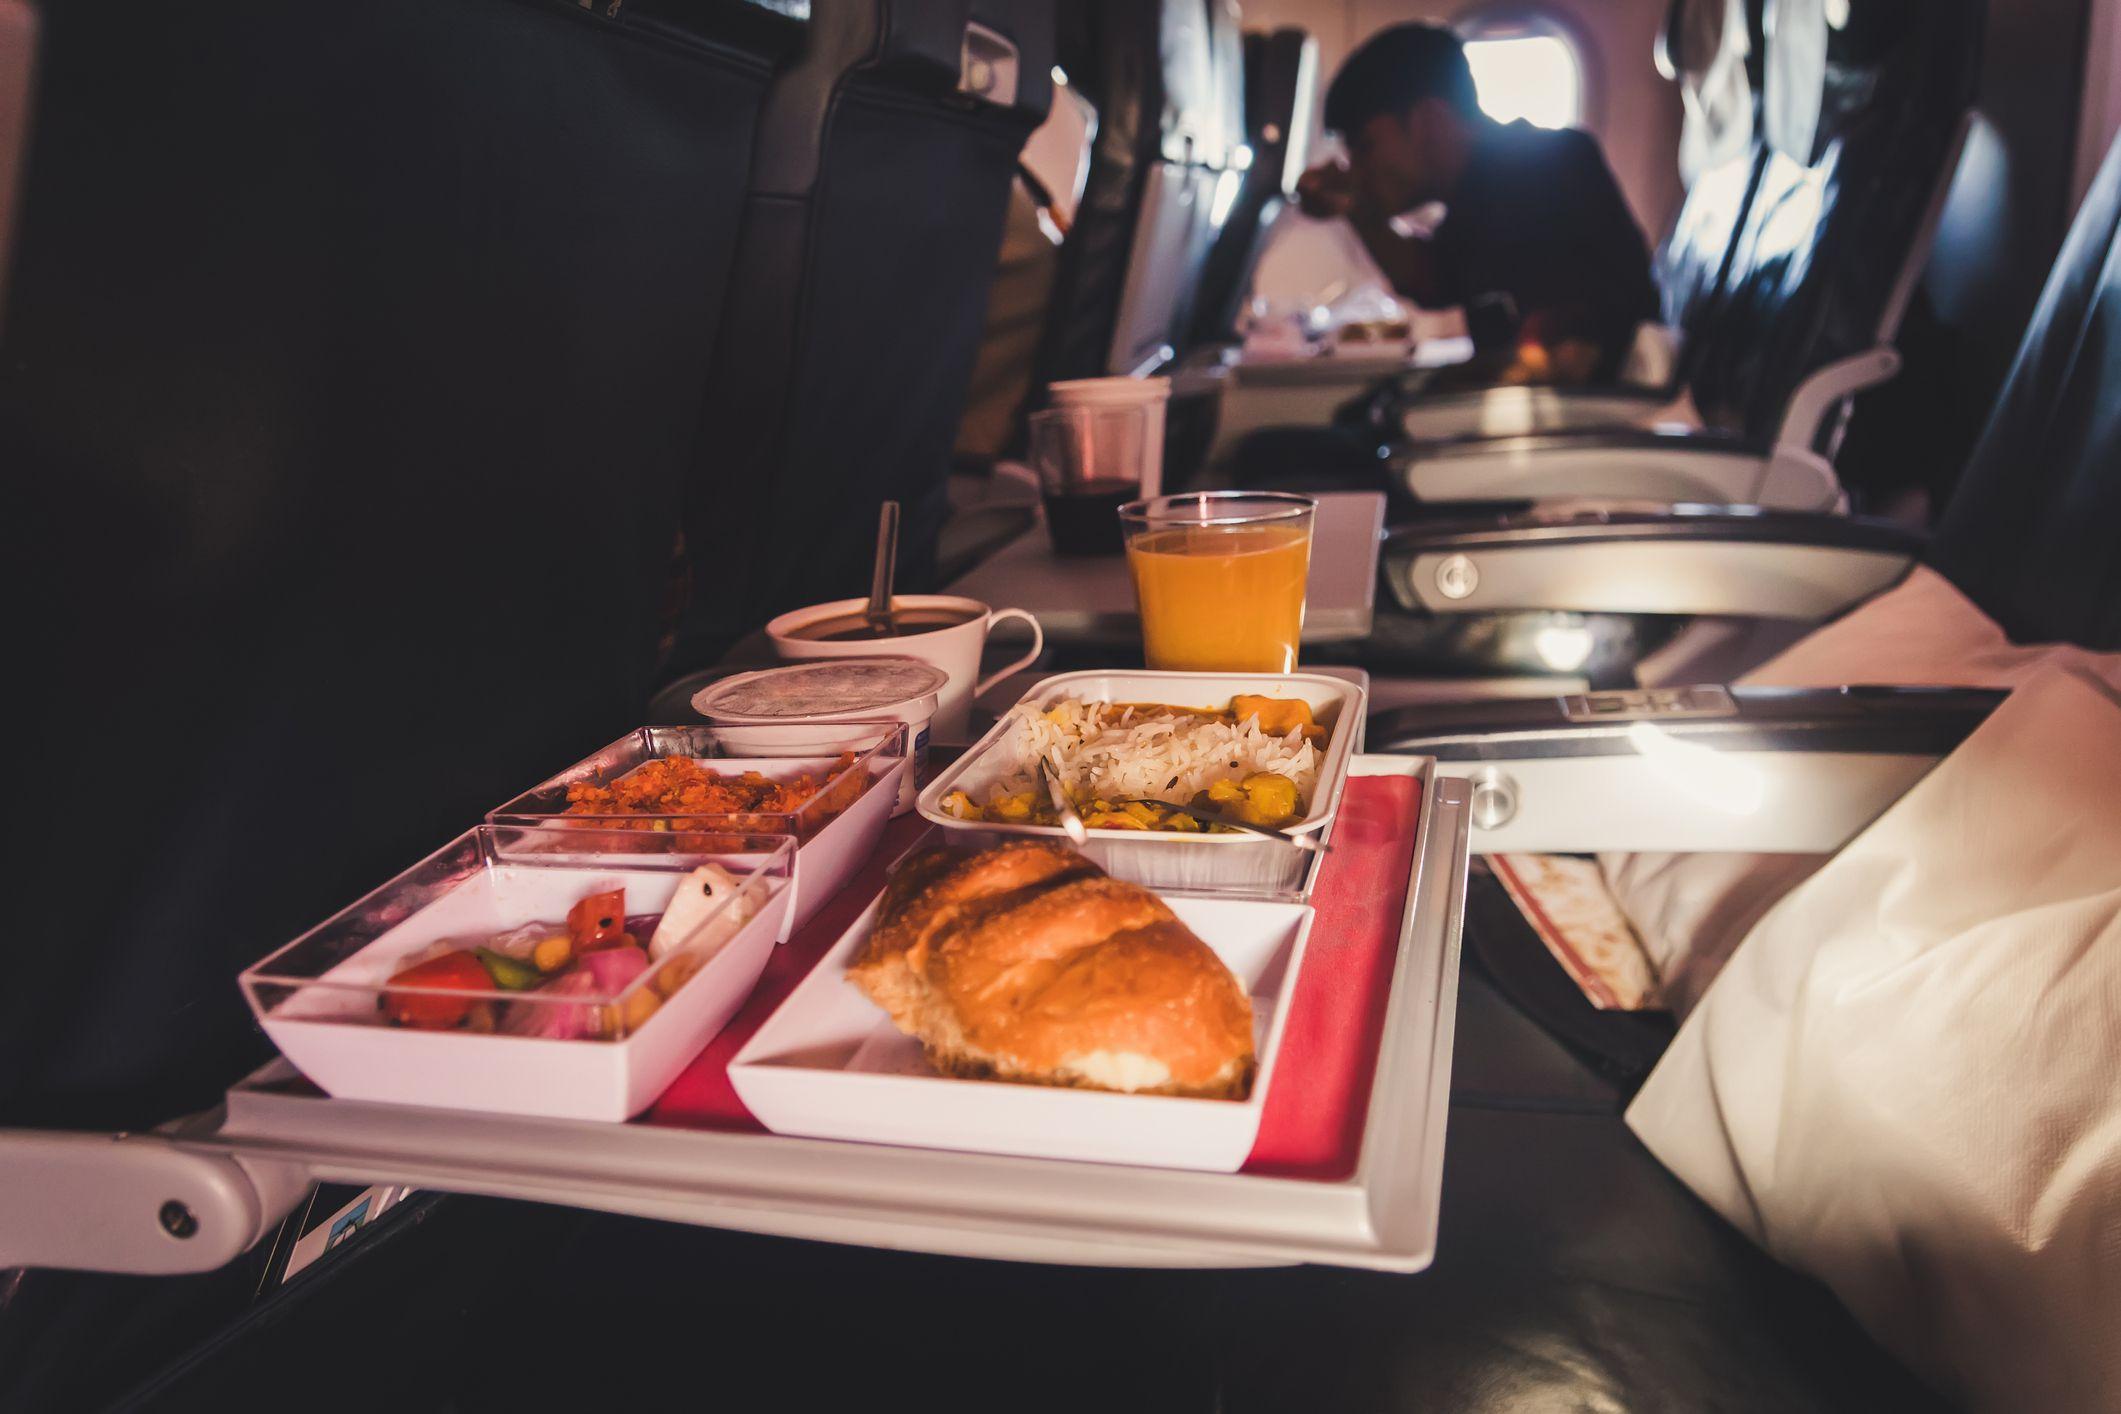 World's Worst Airplane Food